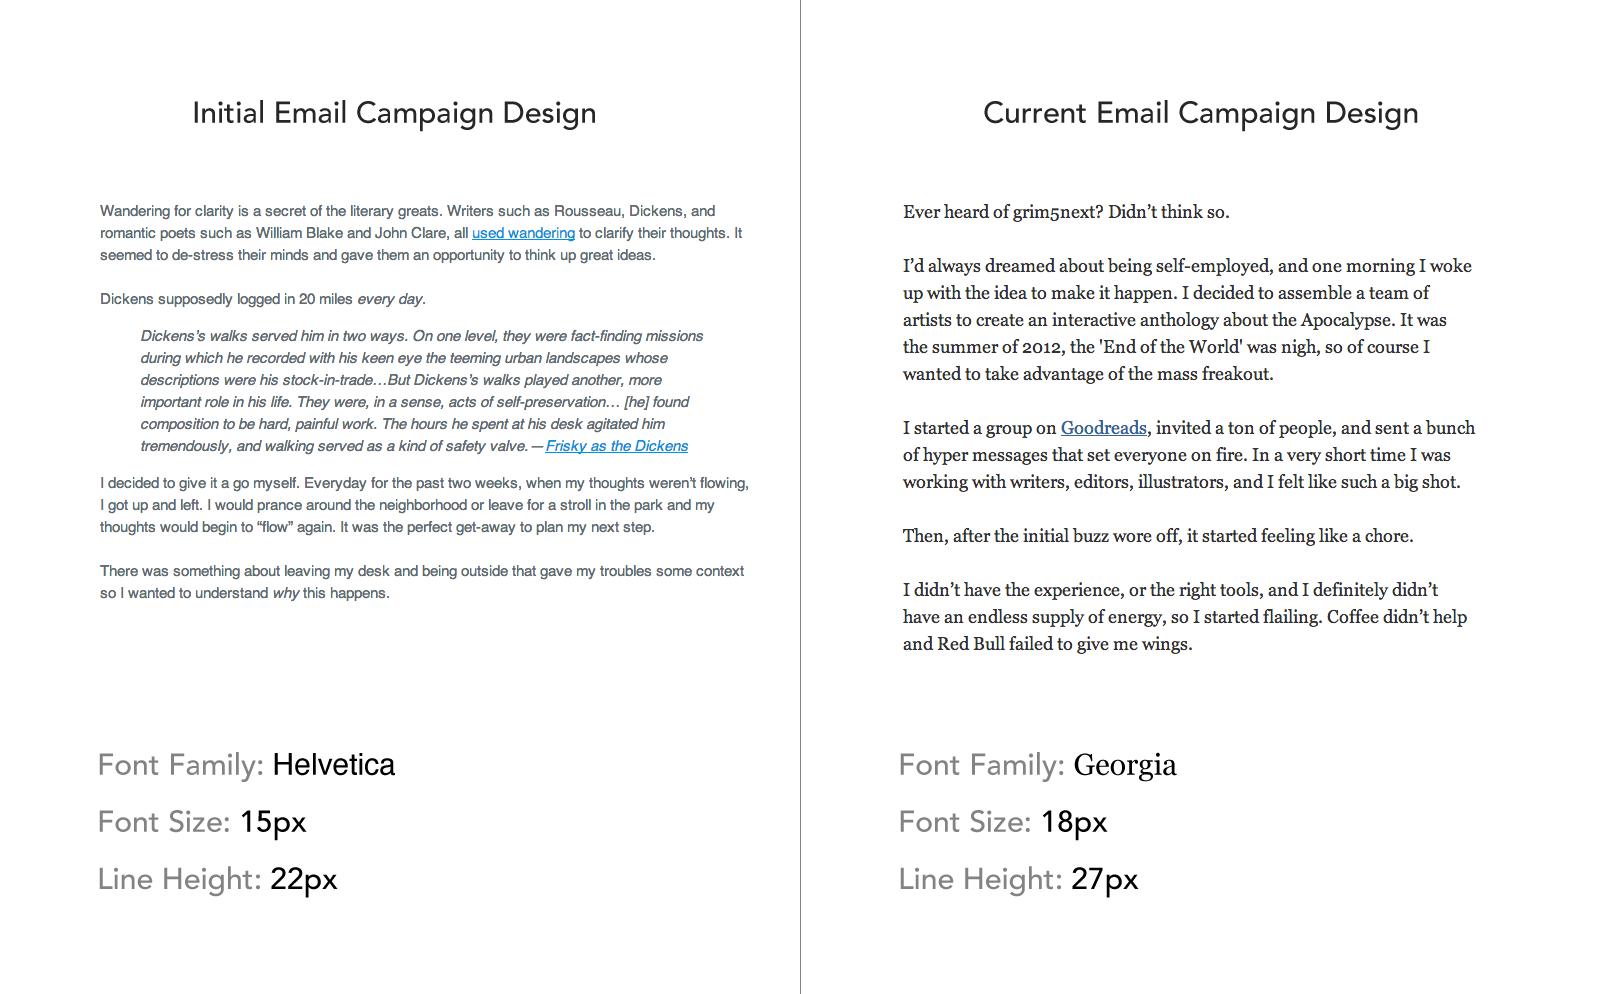 Emailcampaigncomparison